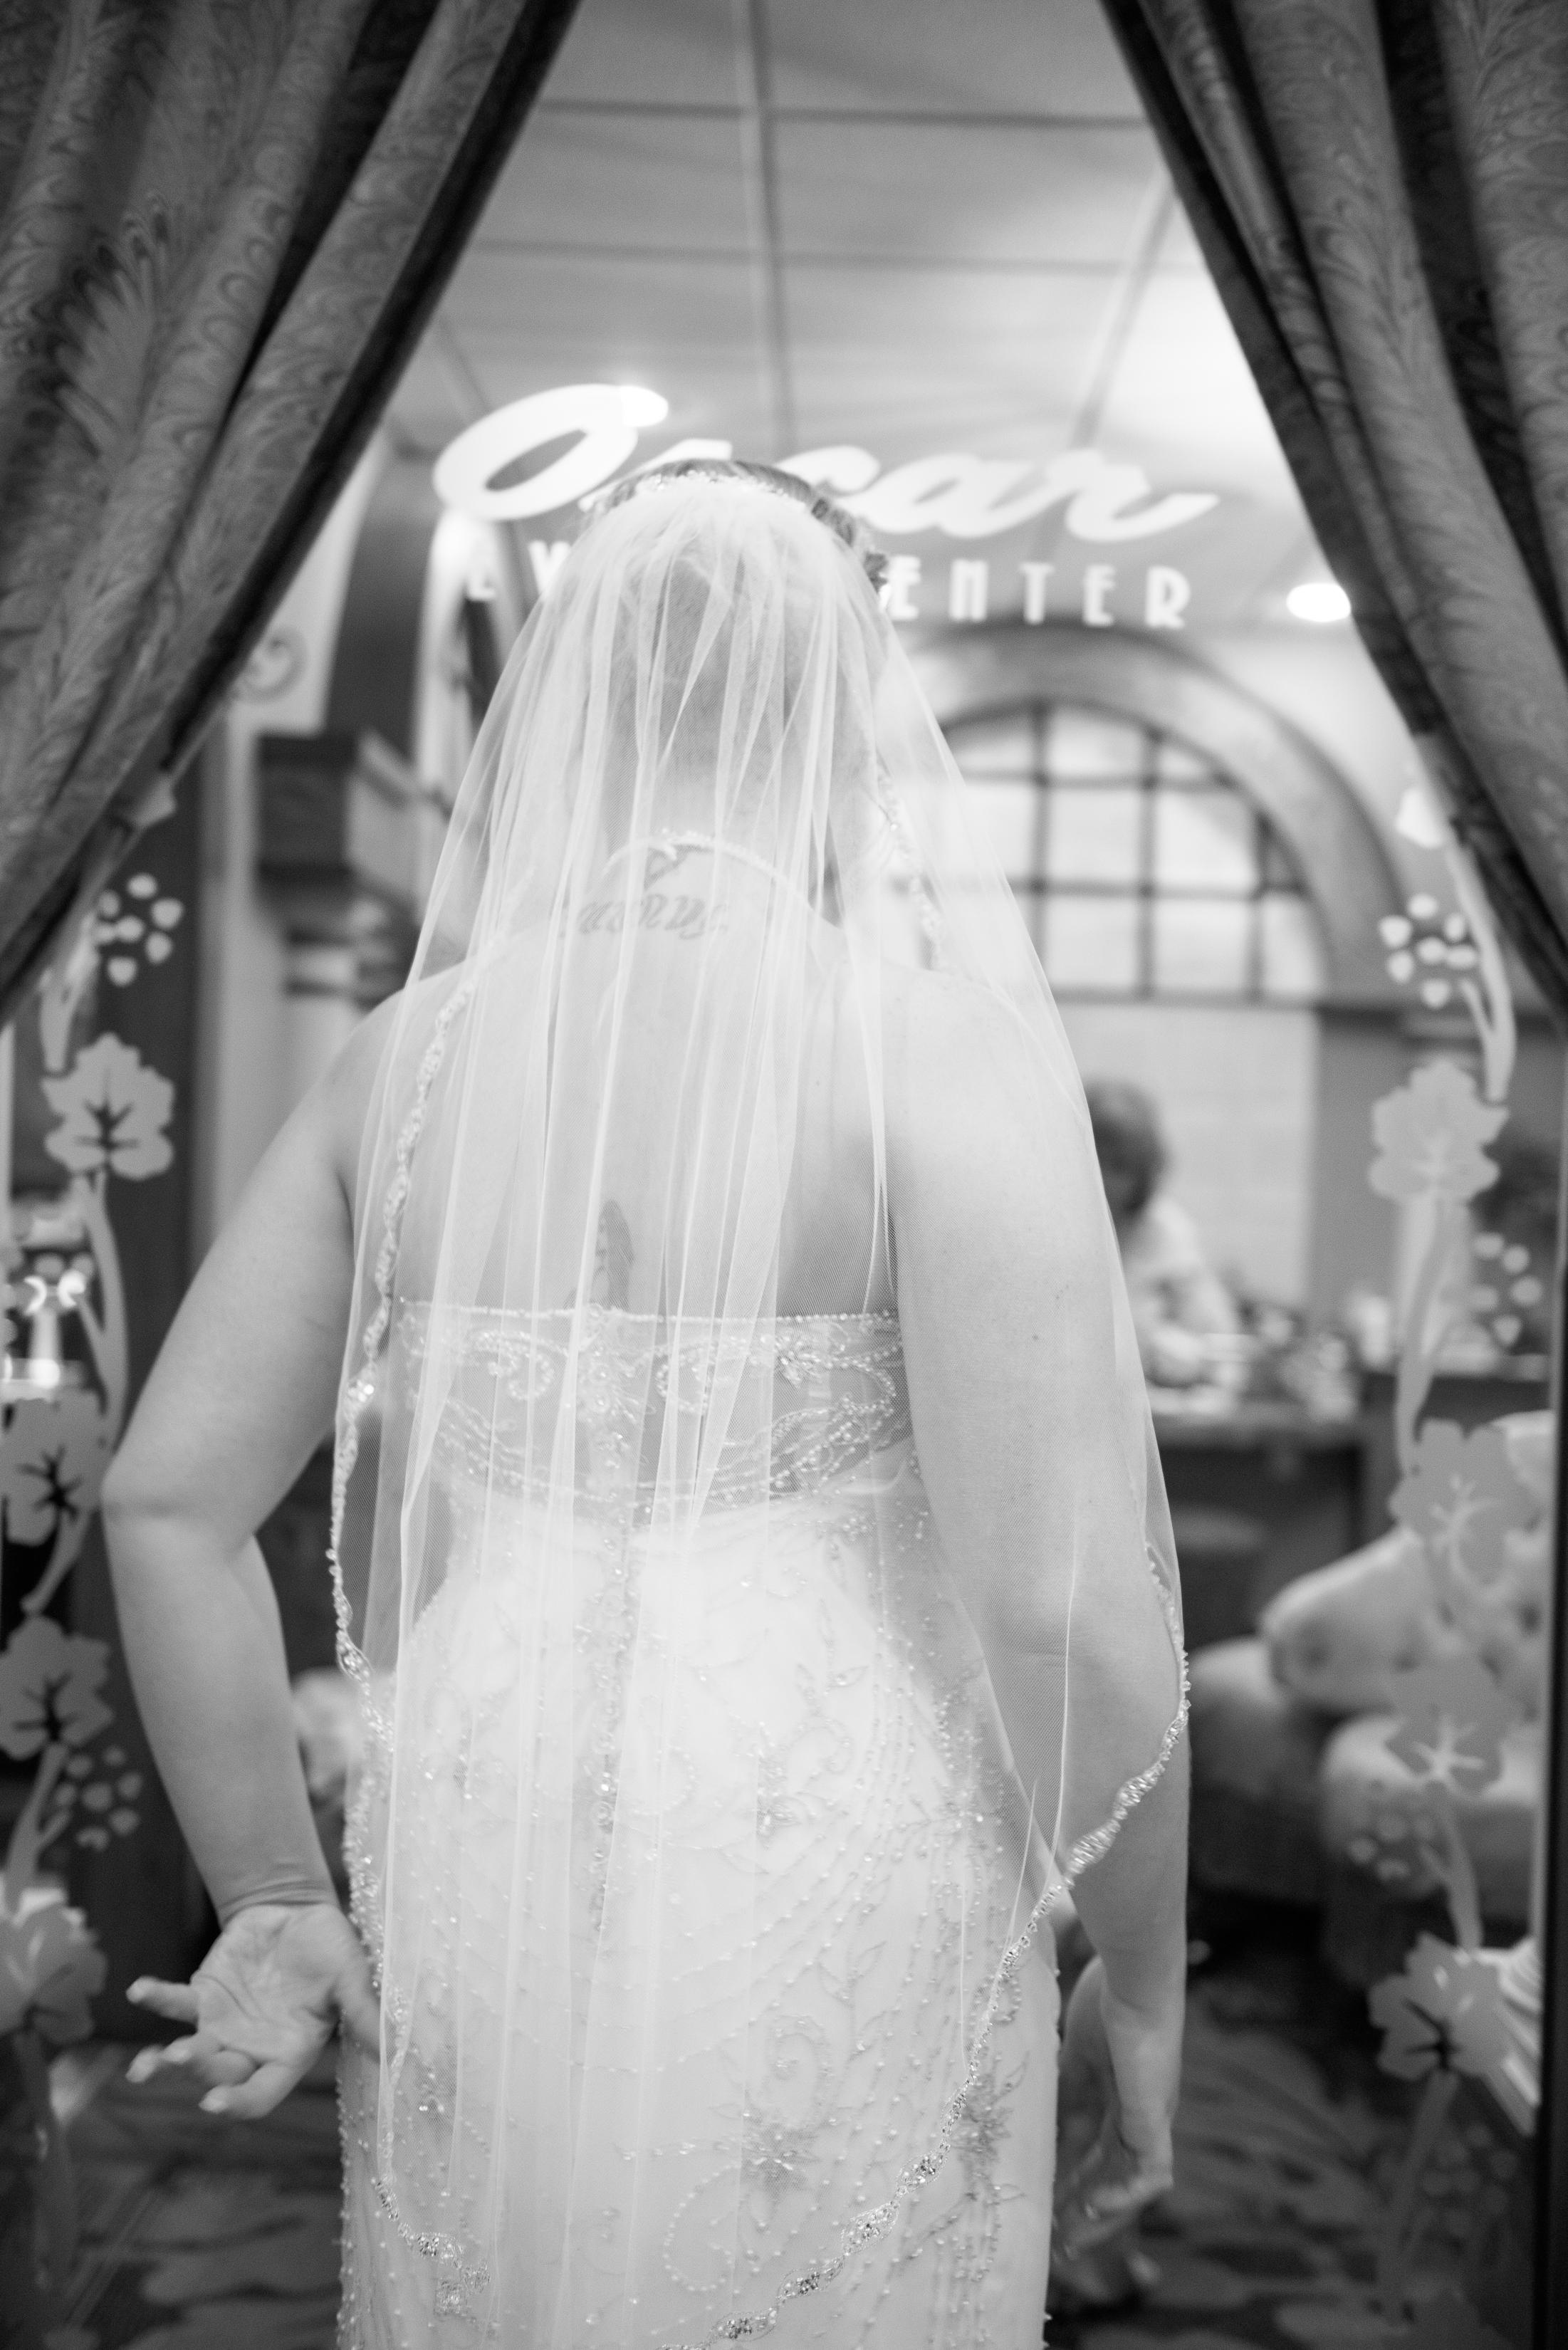 AkersKing_wedding_bw-266 copy.jpg